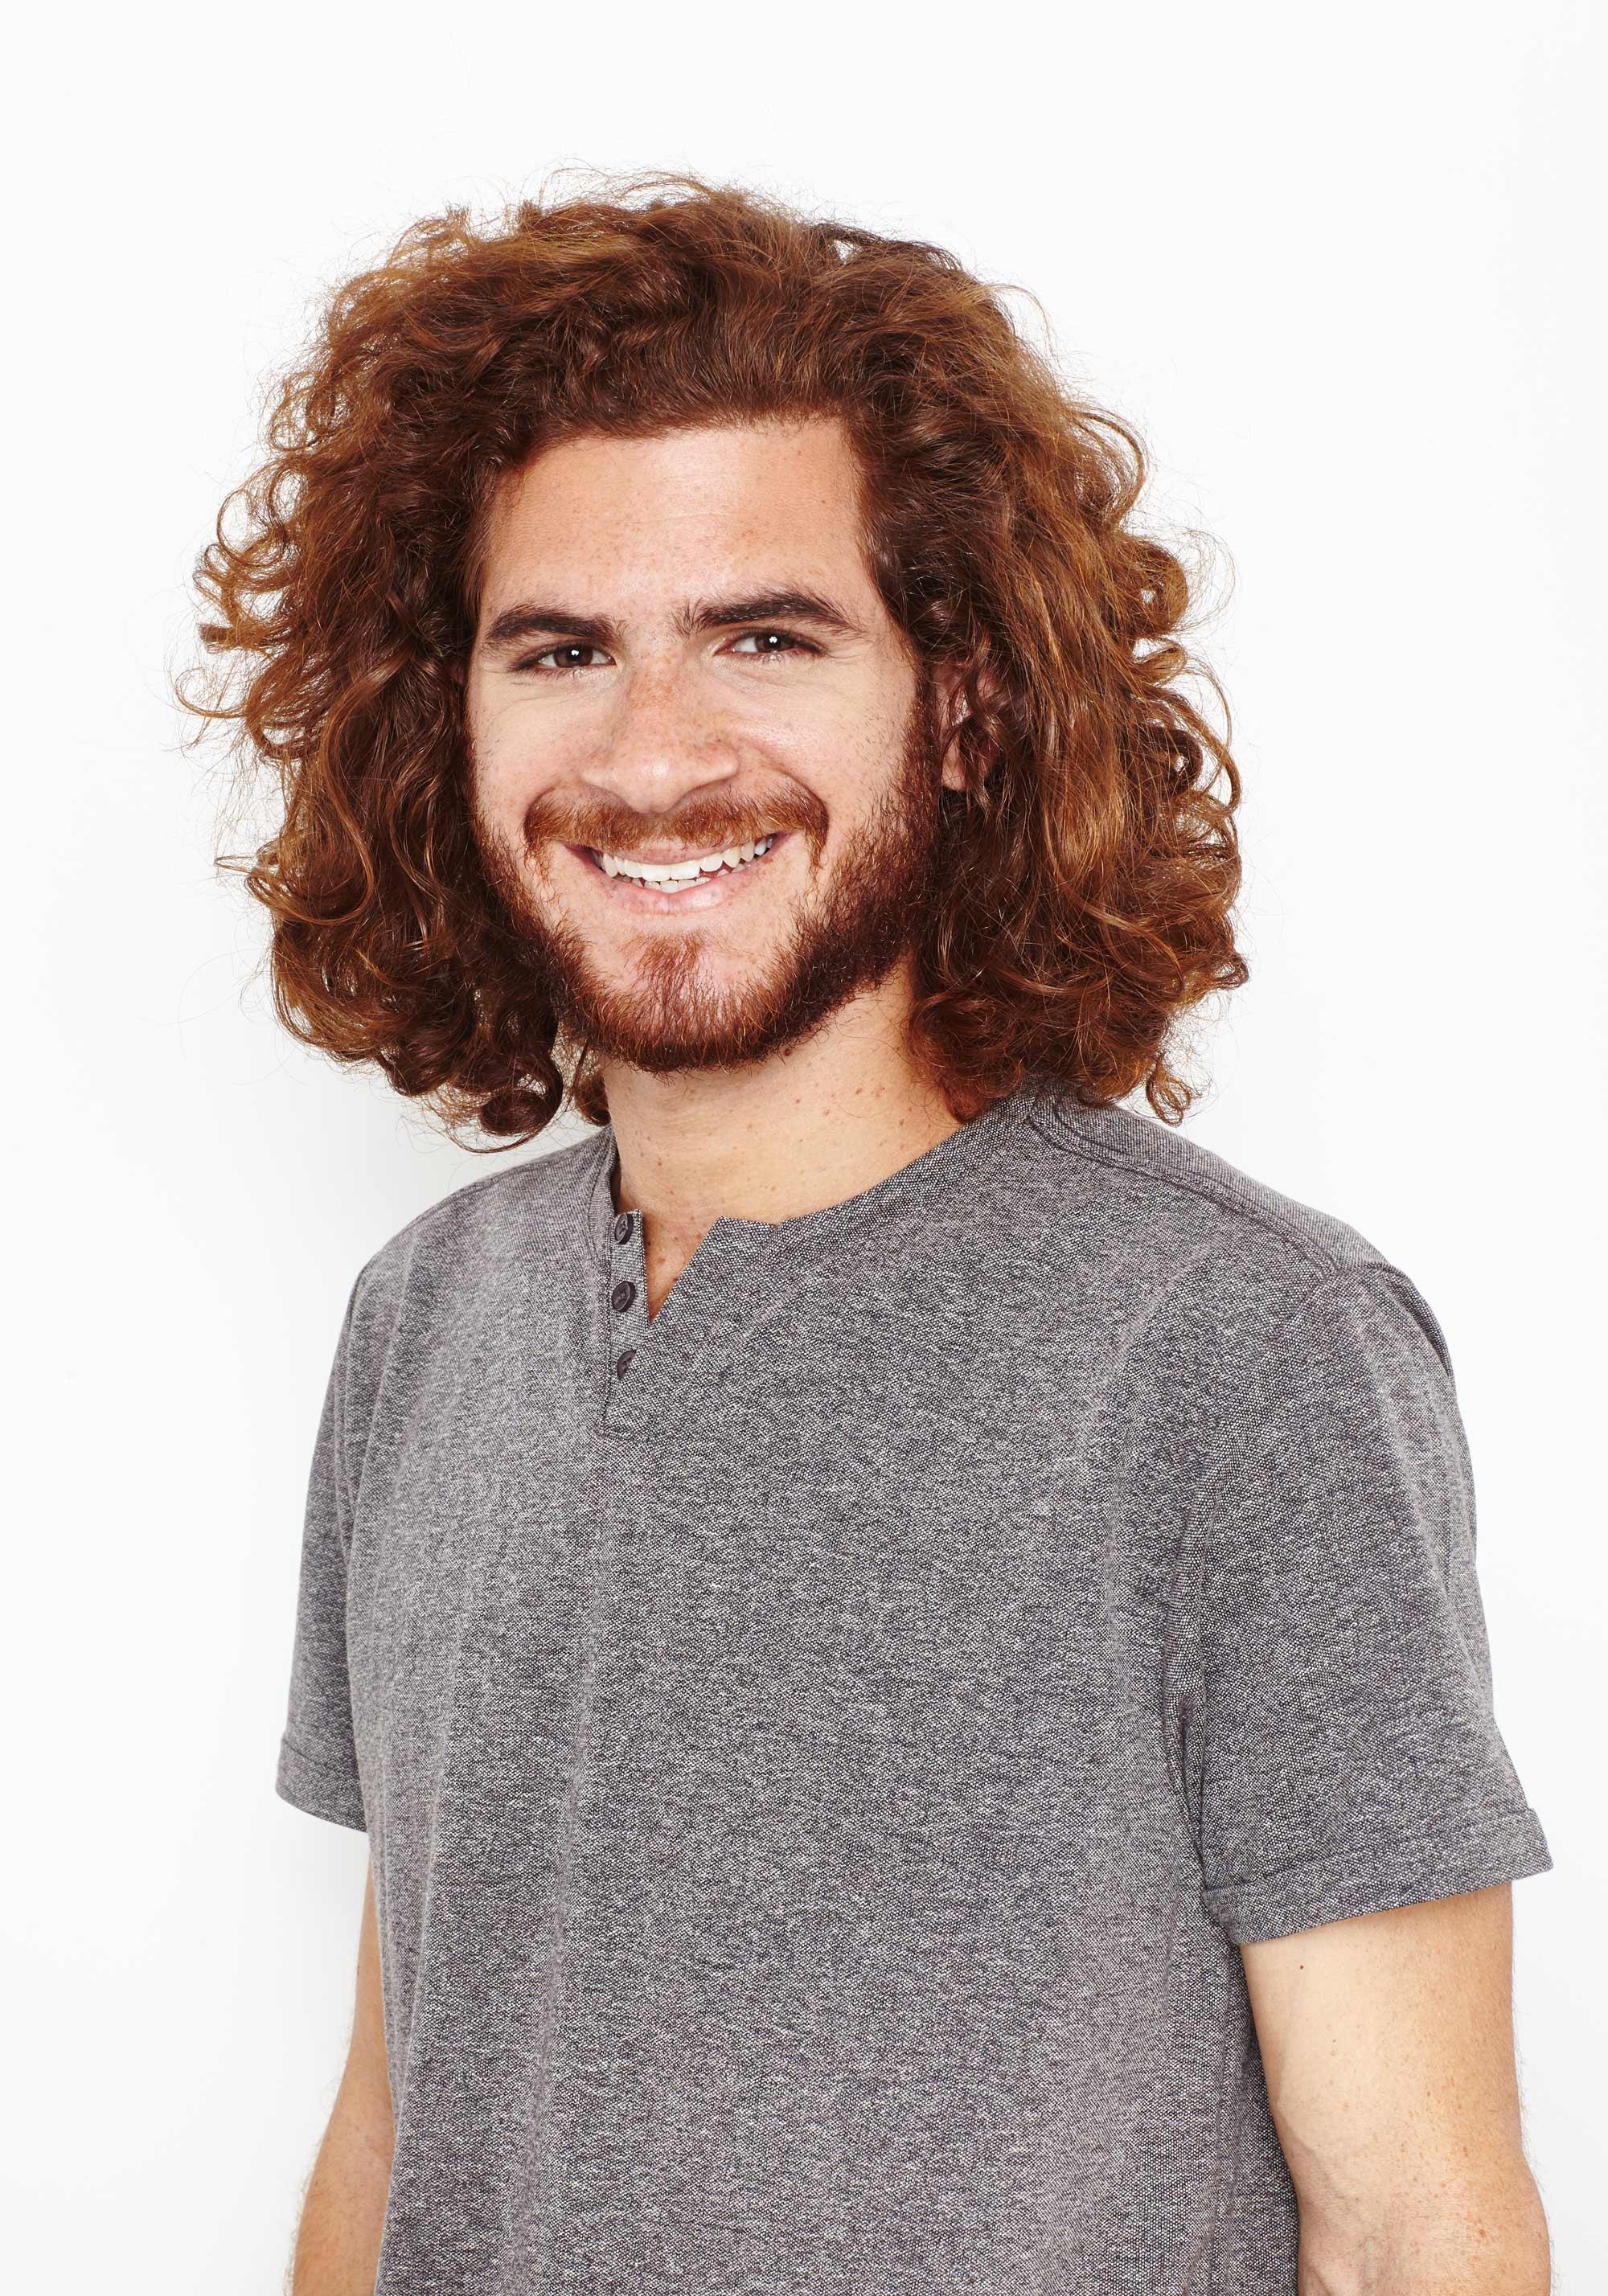 modelo de cabelo ruivo cacheado e de comprimento médio